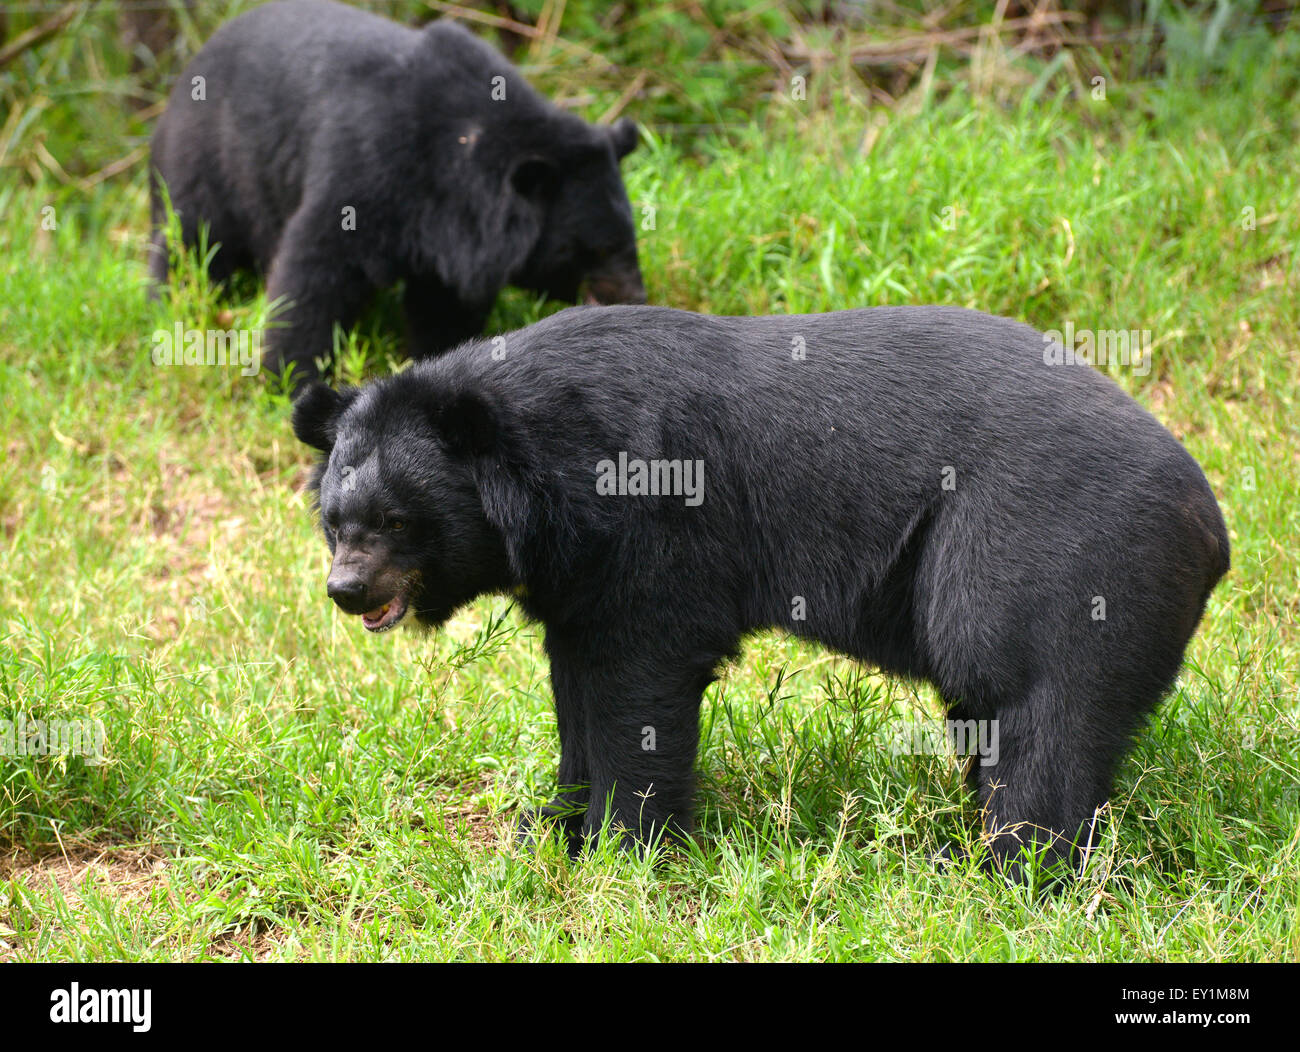 asiatic black bear or moon bear (ursus thibetanus) - Stock Image